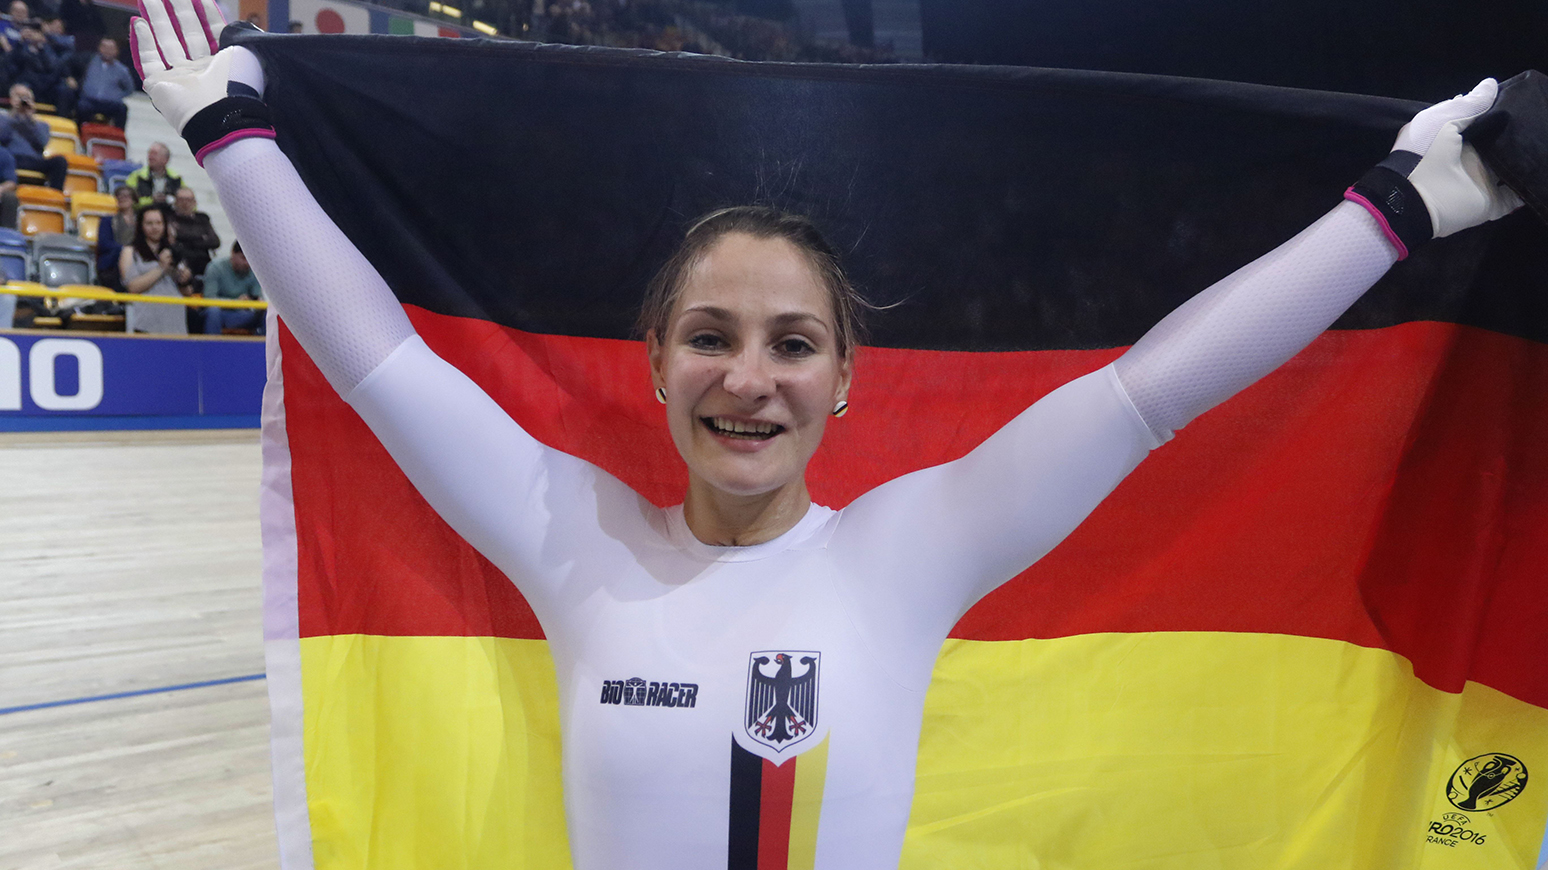 Kristina Vogel, Radsportler des Jahres